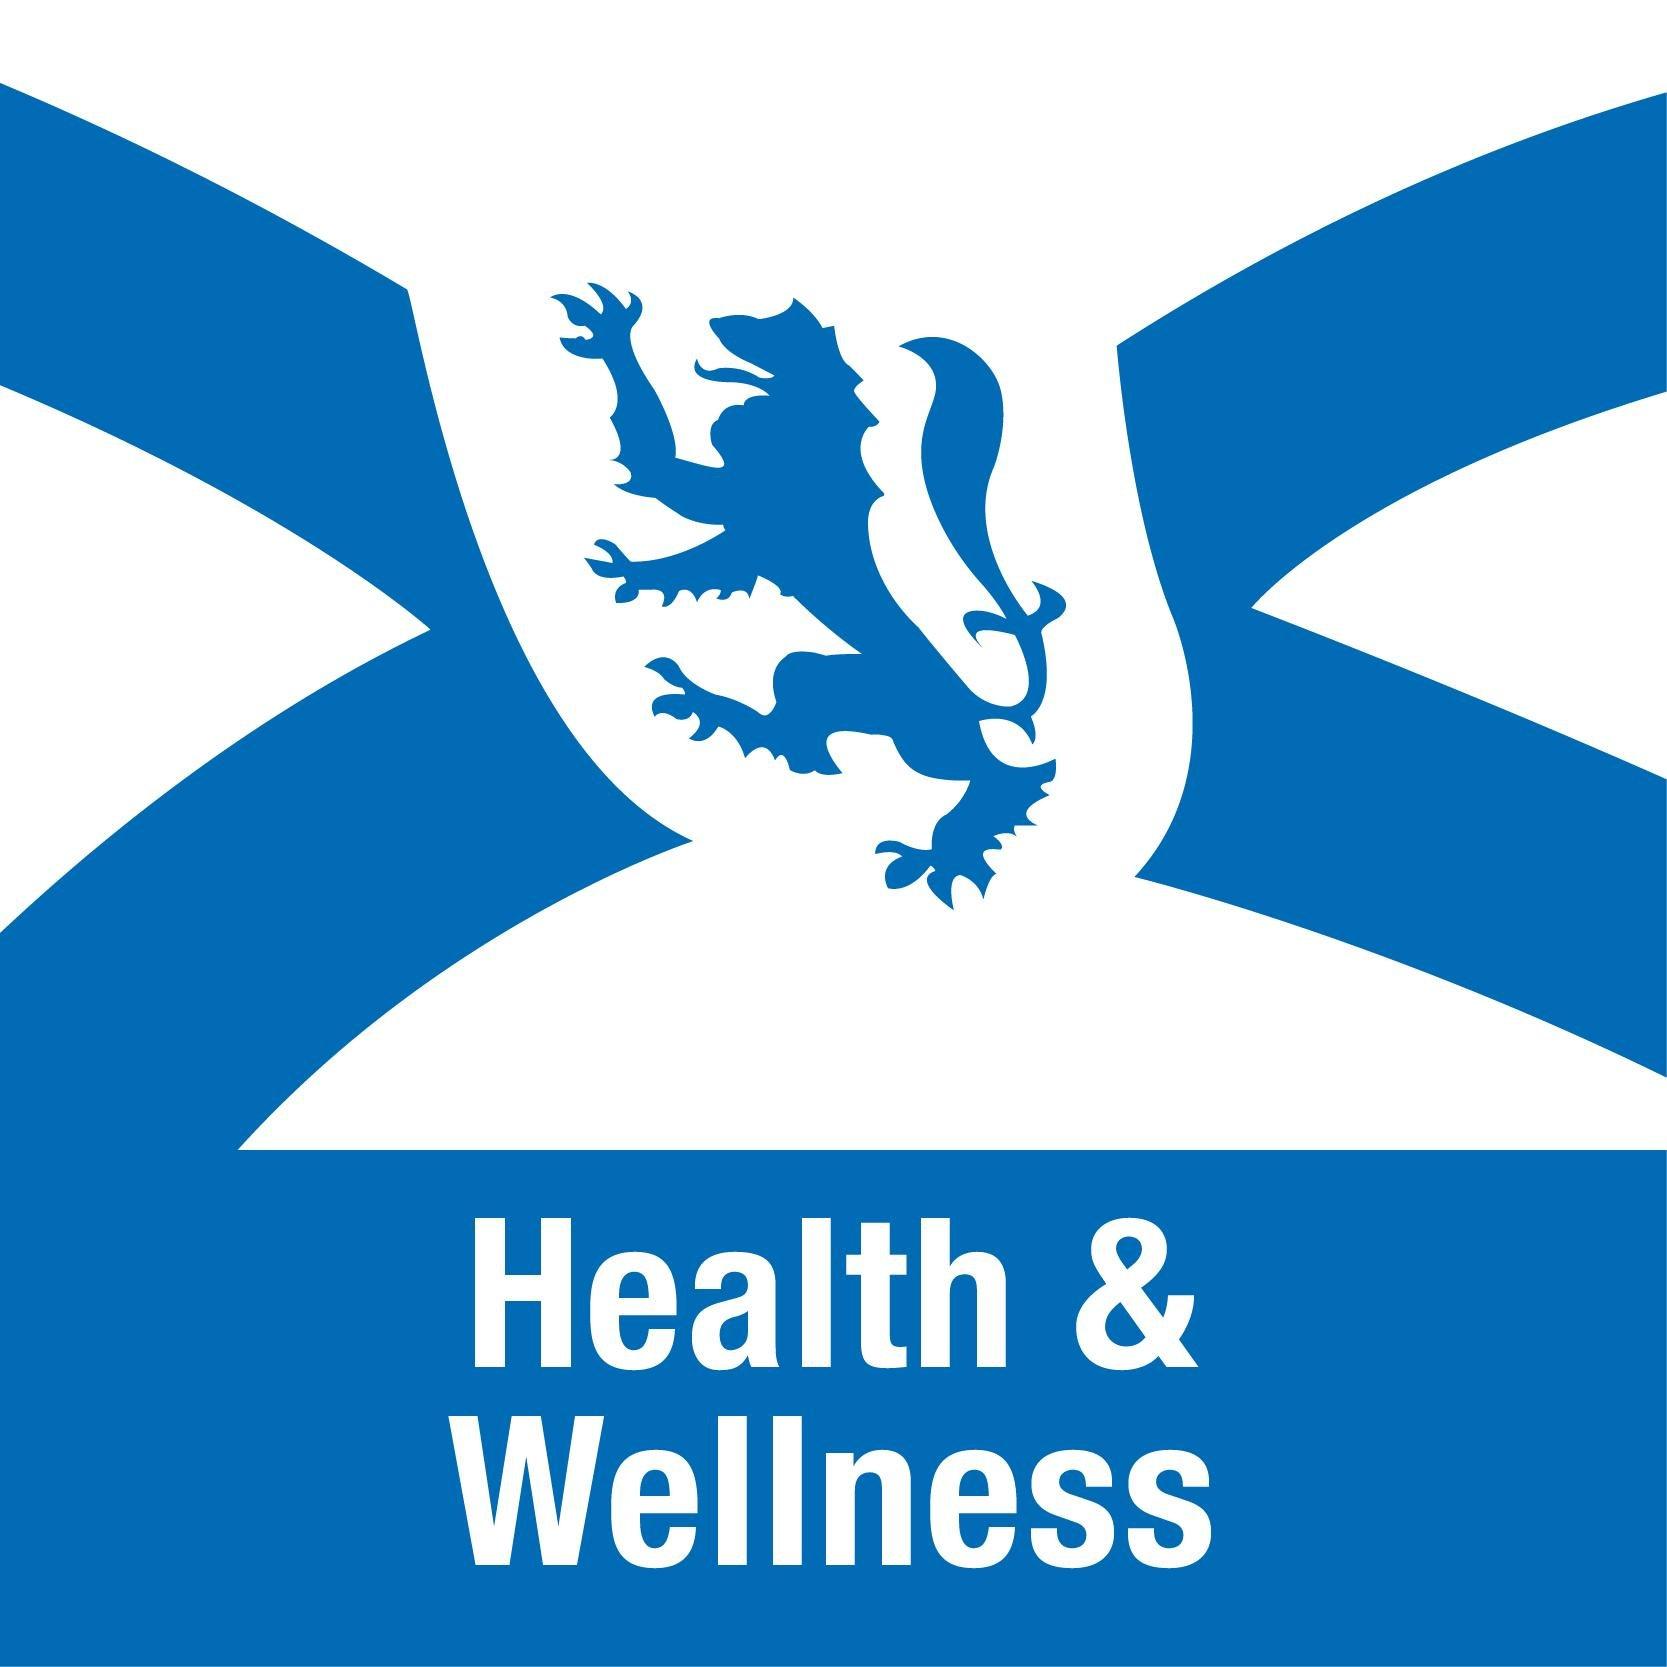 Health And Wellness: Health & Wellness (@DHWNovaScotia)